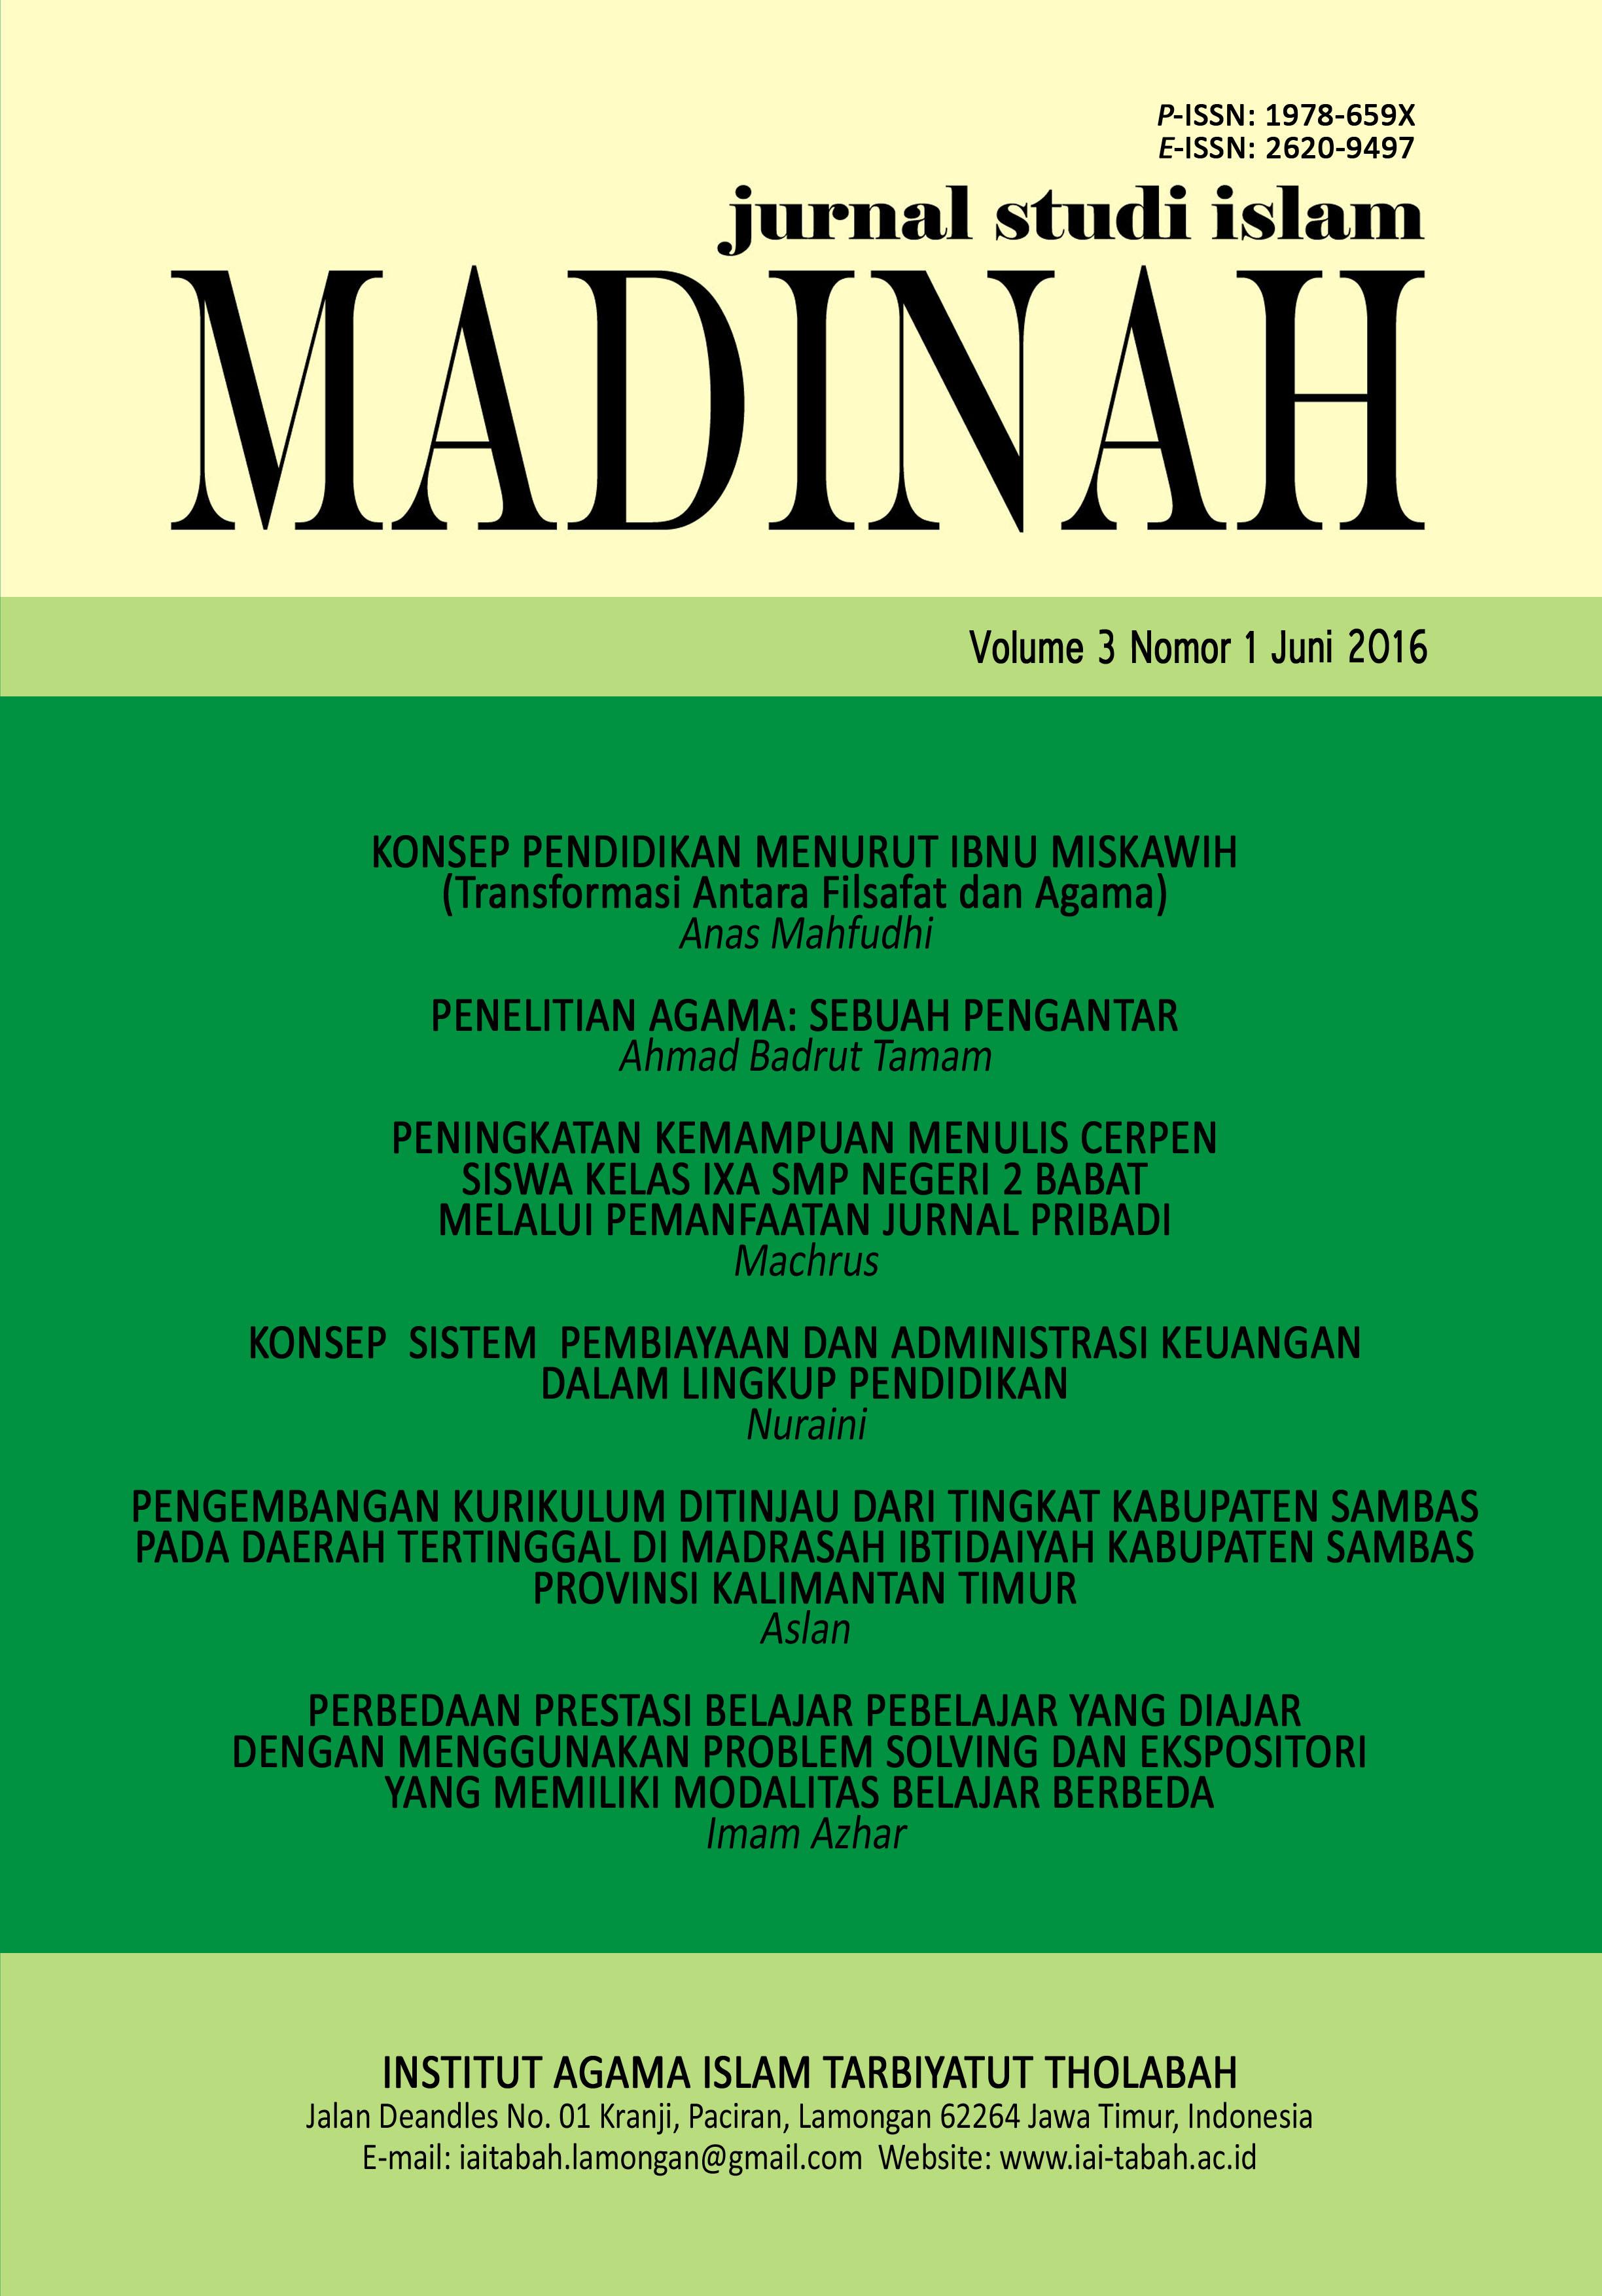 Archives Madinah Jurnal Studi Islam